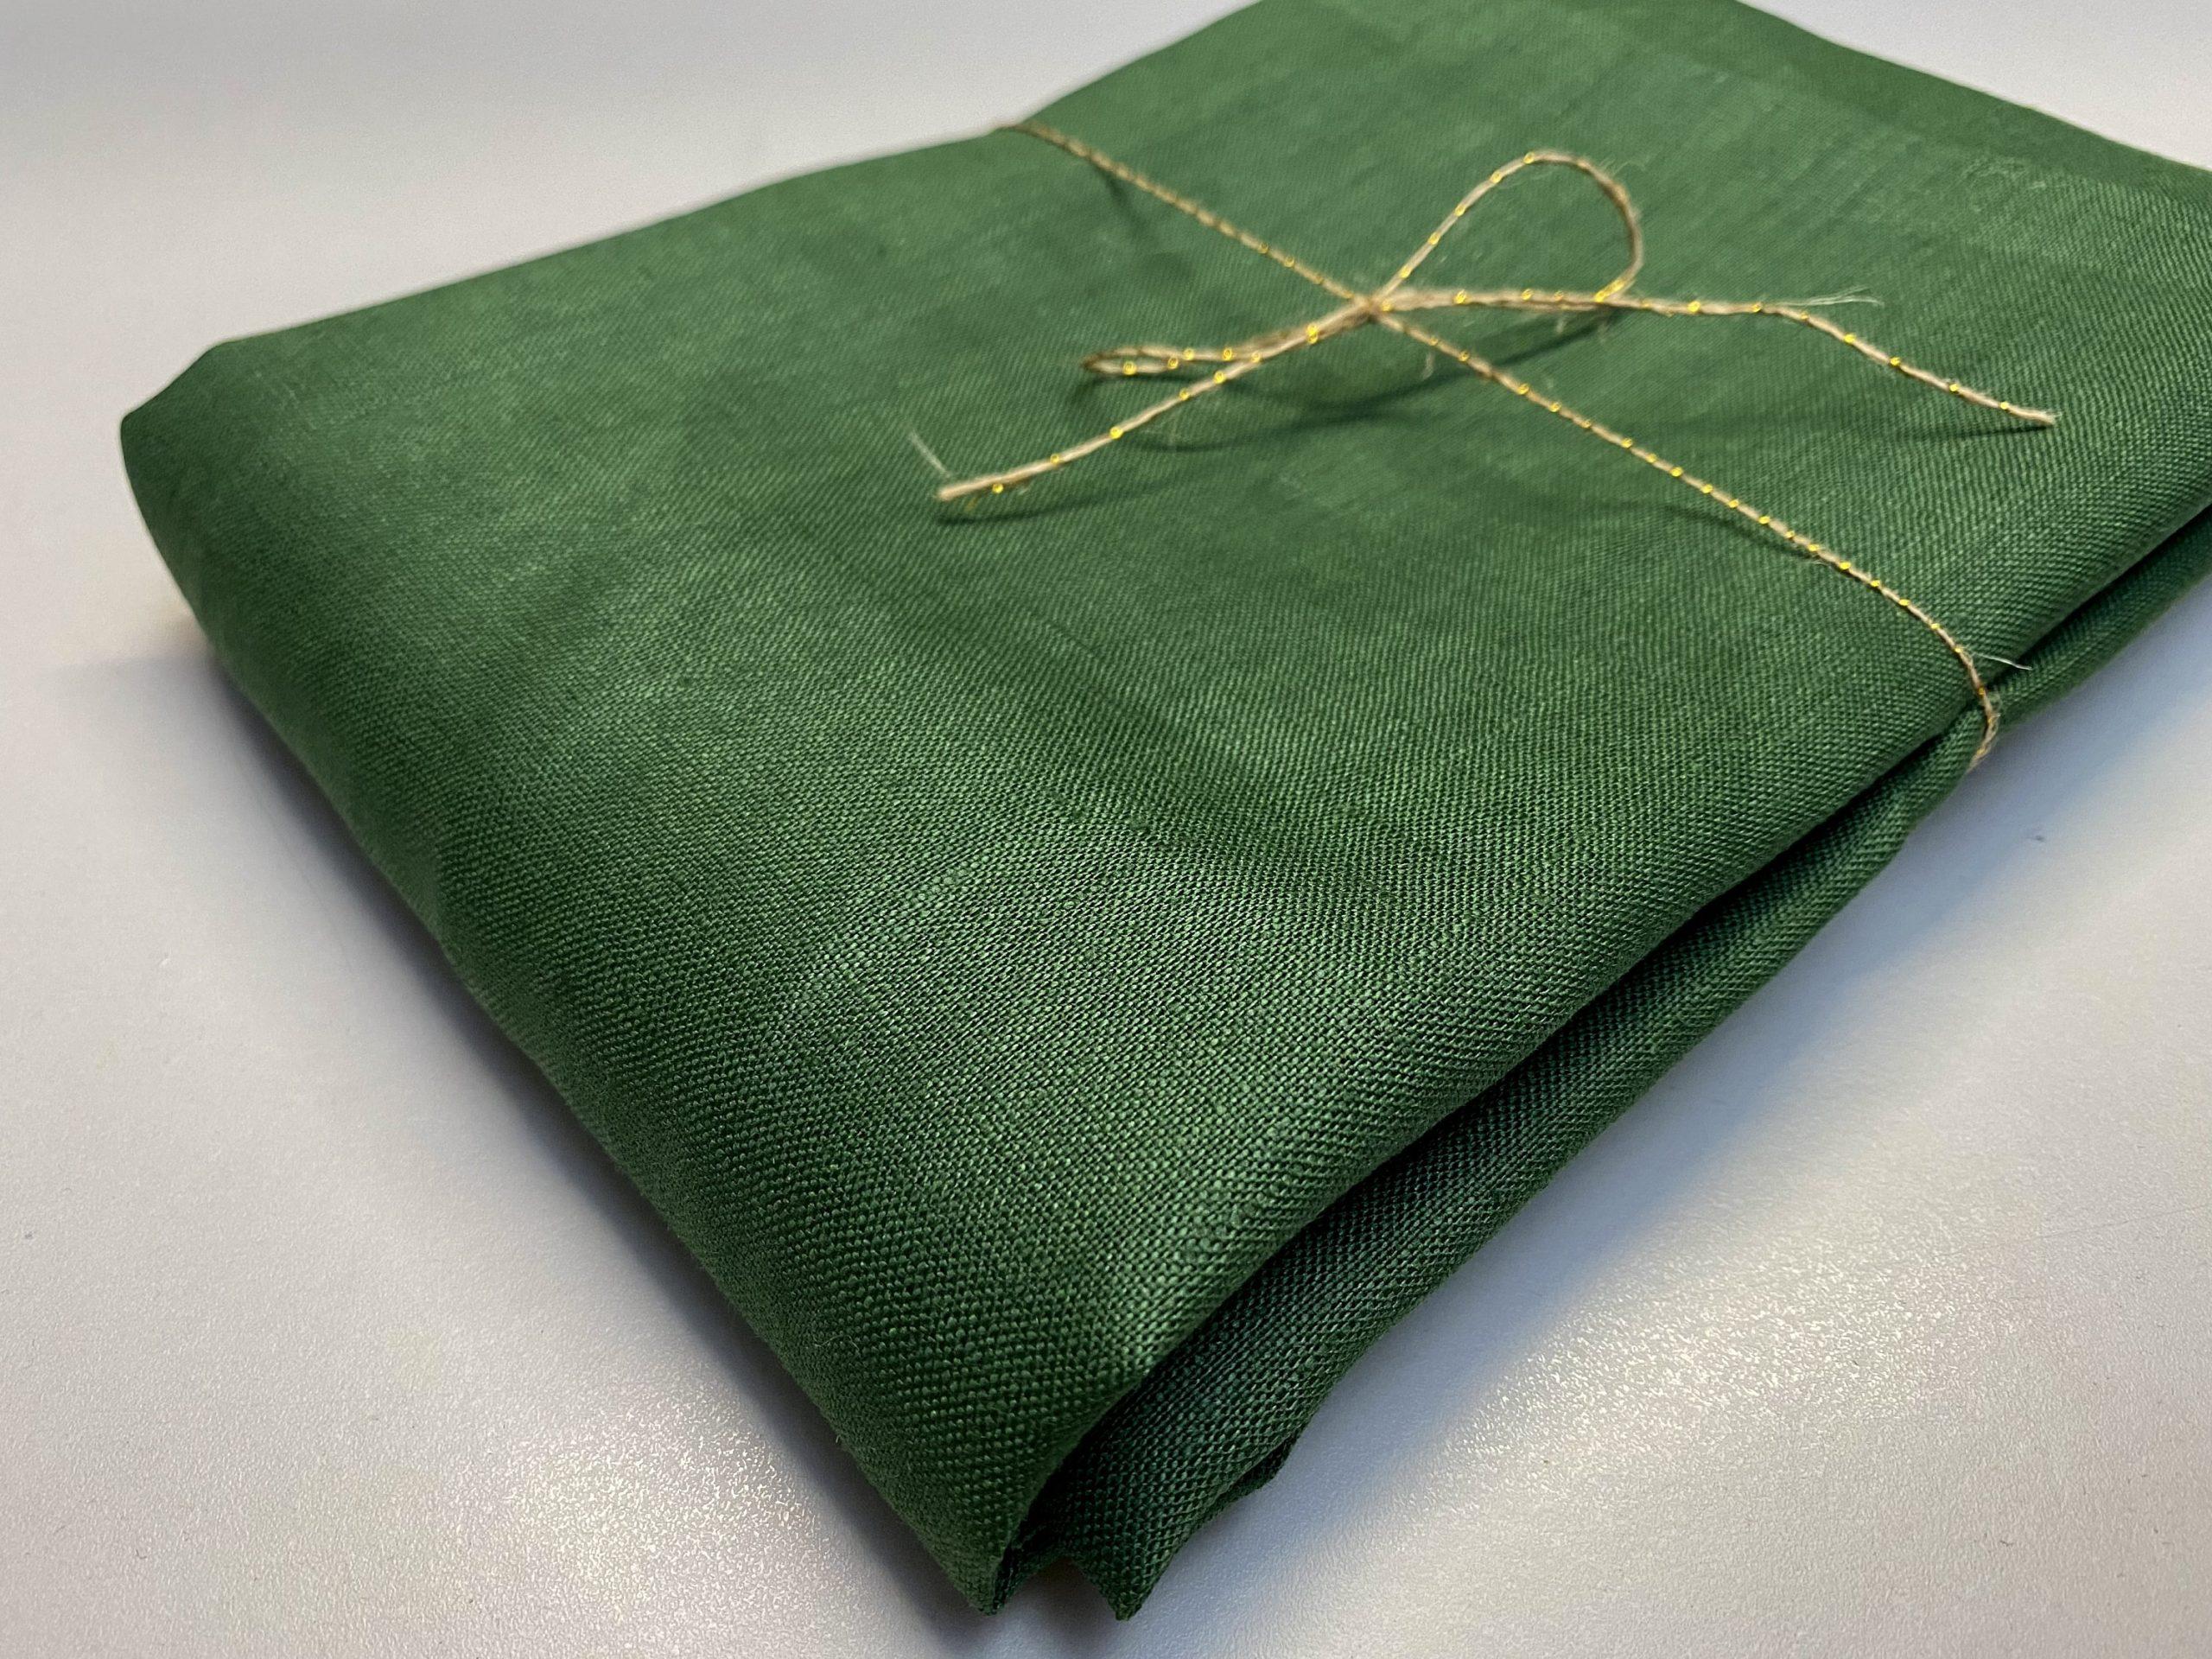 Soft Linen Fabric Material –  100% Linen for Home Decor, Curtains, Clothes – 140cm wide – Plain GREEN